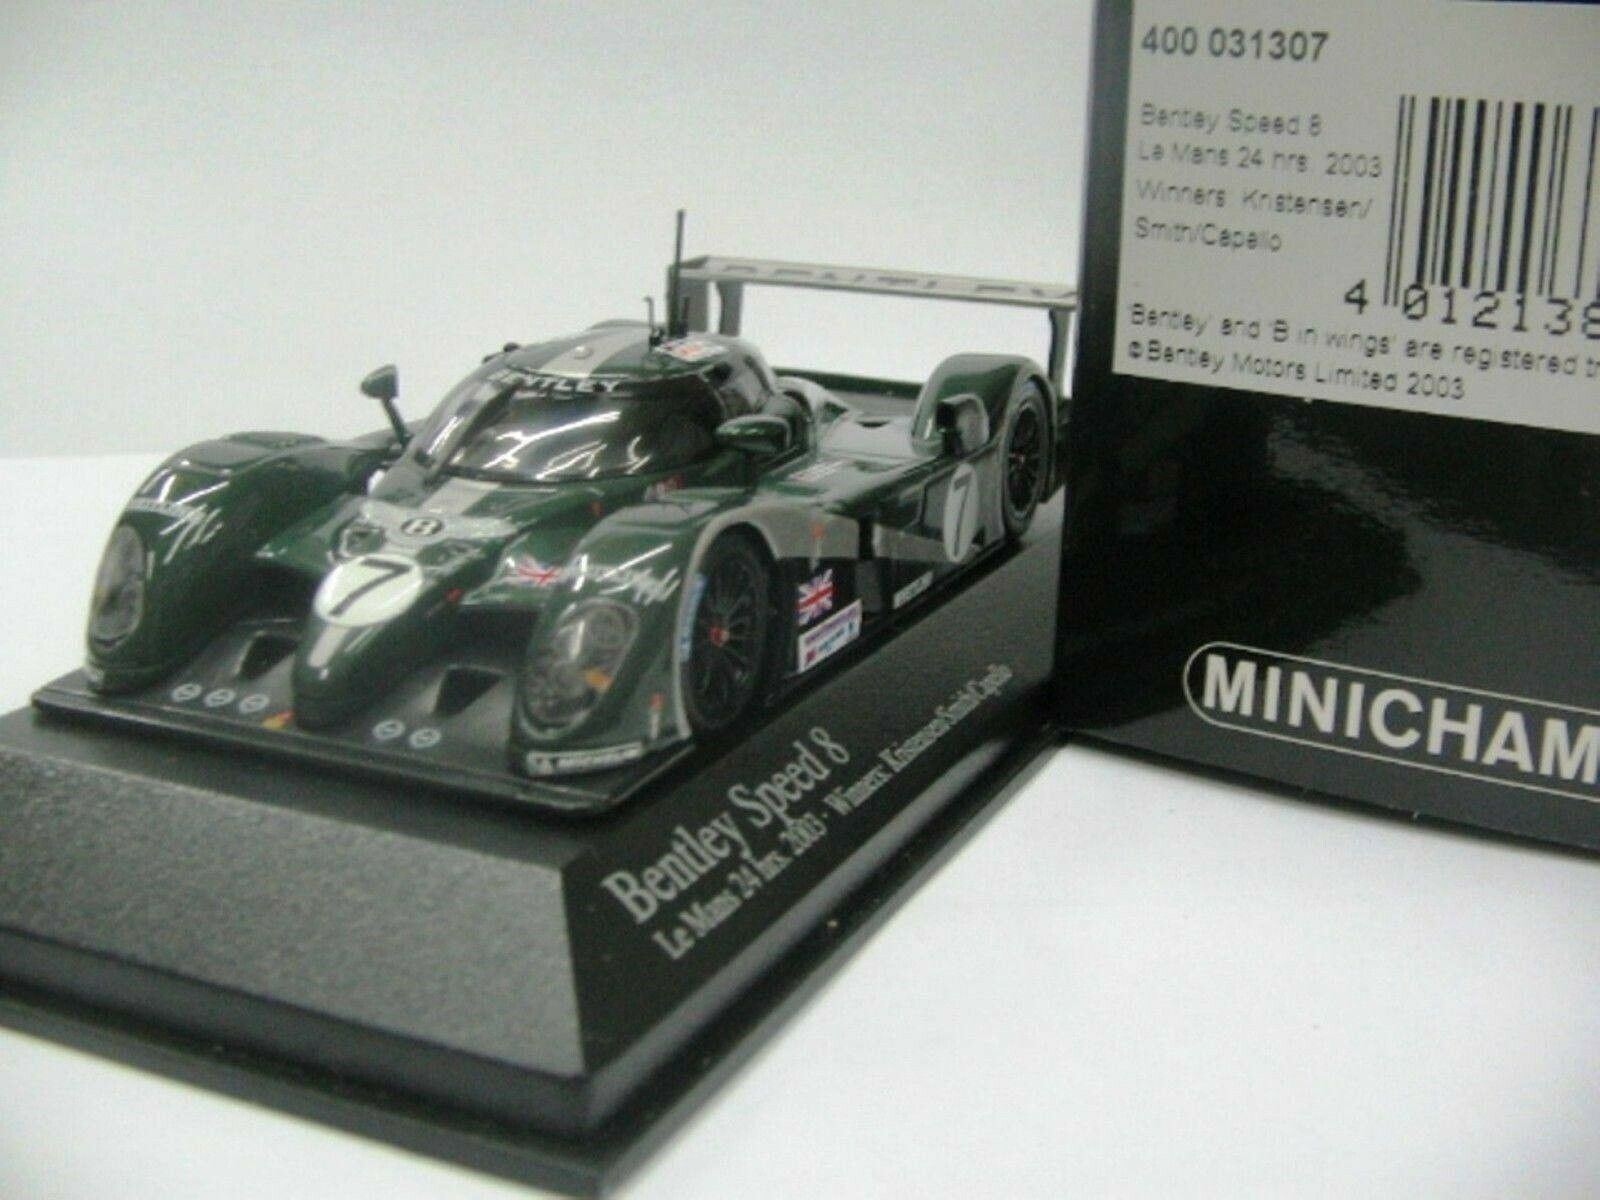 WOW estremamente raro Bentley EXP 8 2003  7 WINNER 24h LE MANS 1 43 Minichamps GT